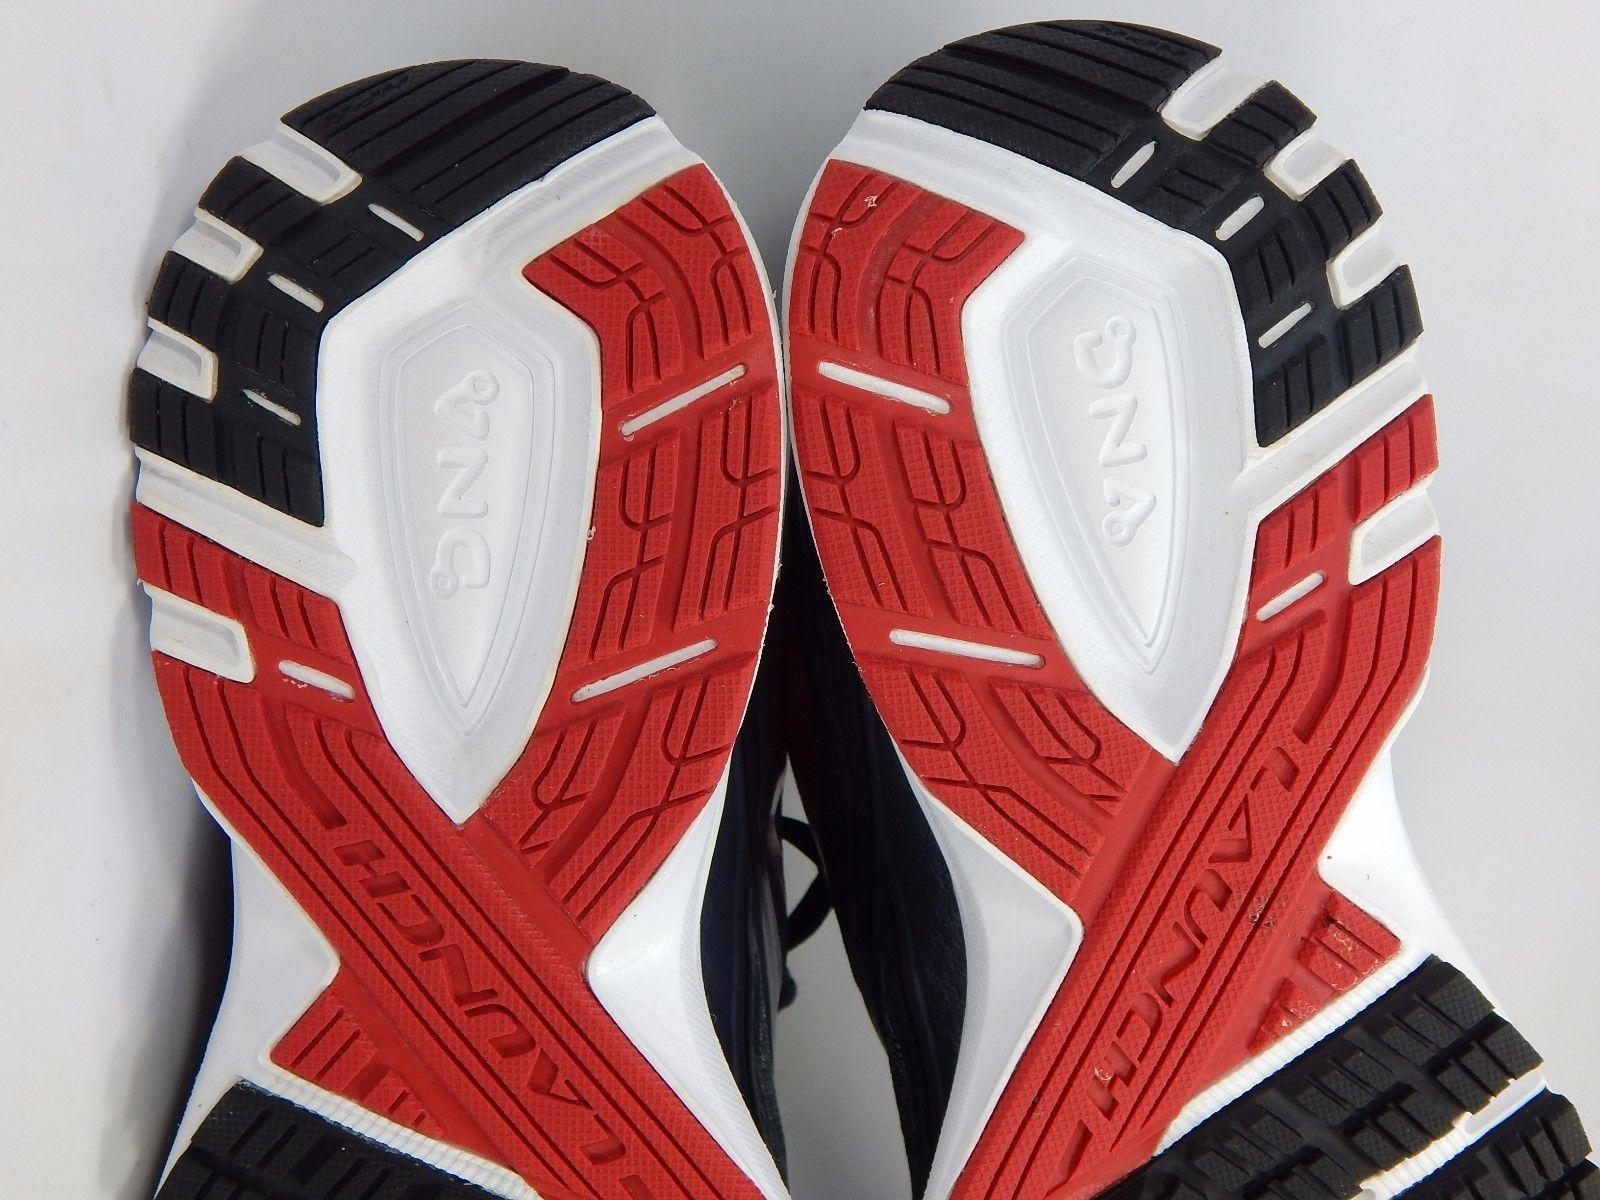 Brooks Launch 4 Men's Running Shoes Size US 10.5 M (D) EU 44.5 Gray 1102441D016